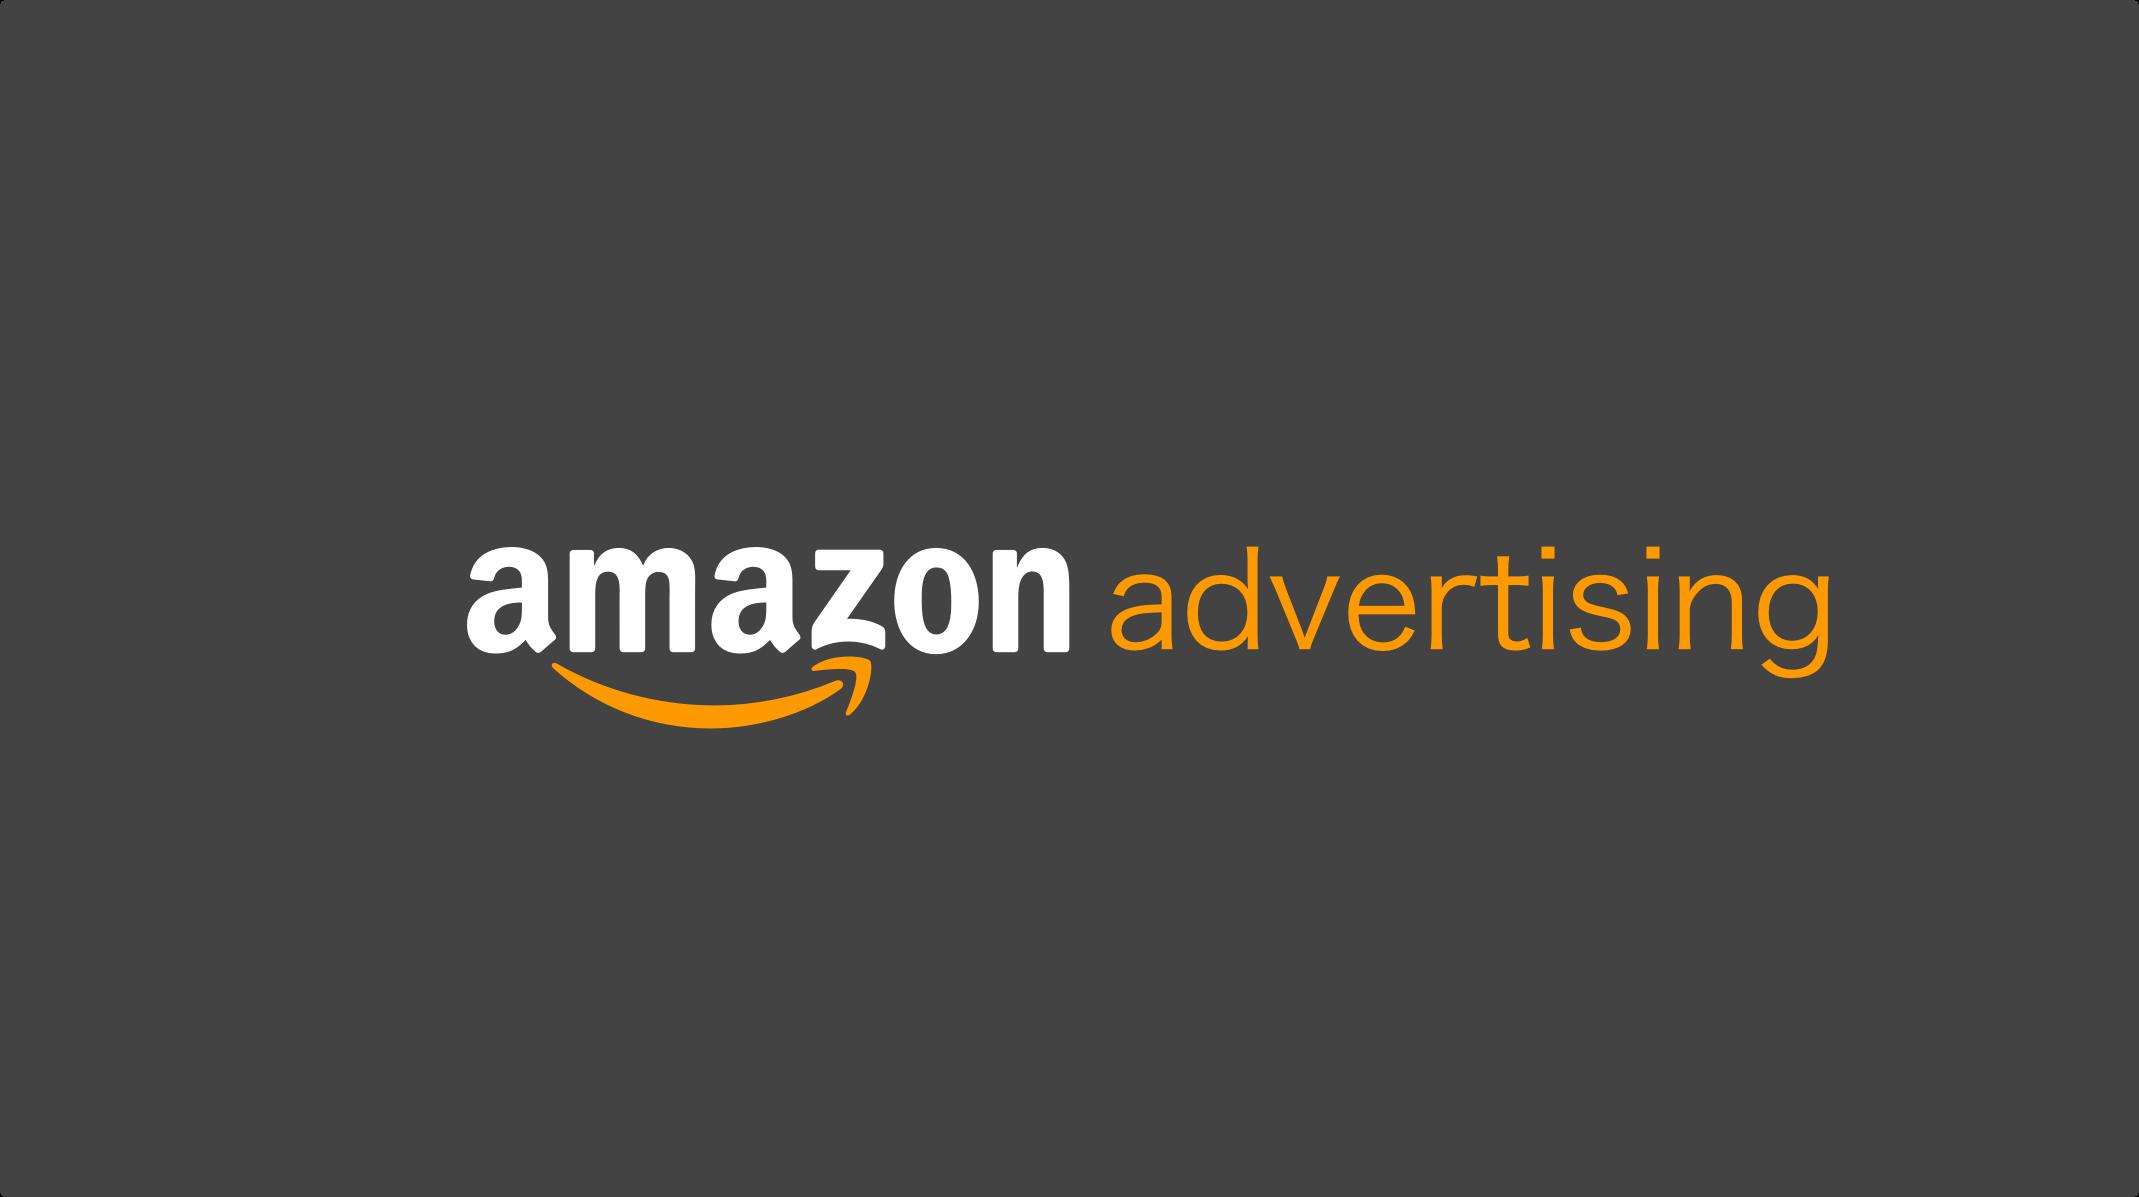 amazon advertising